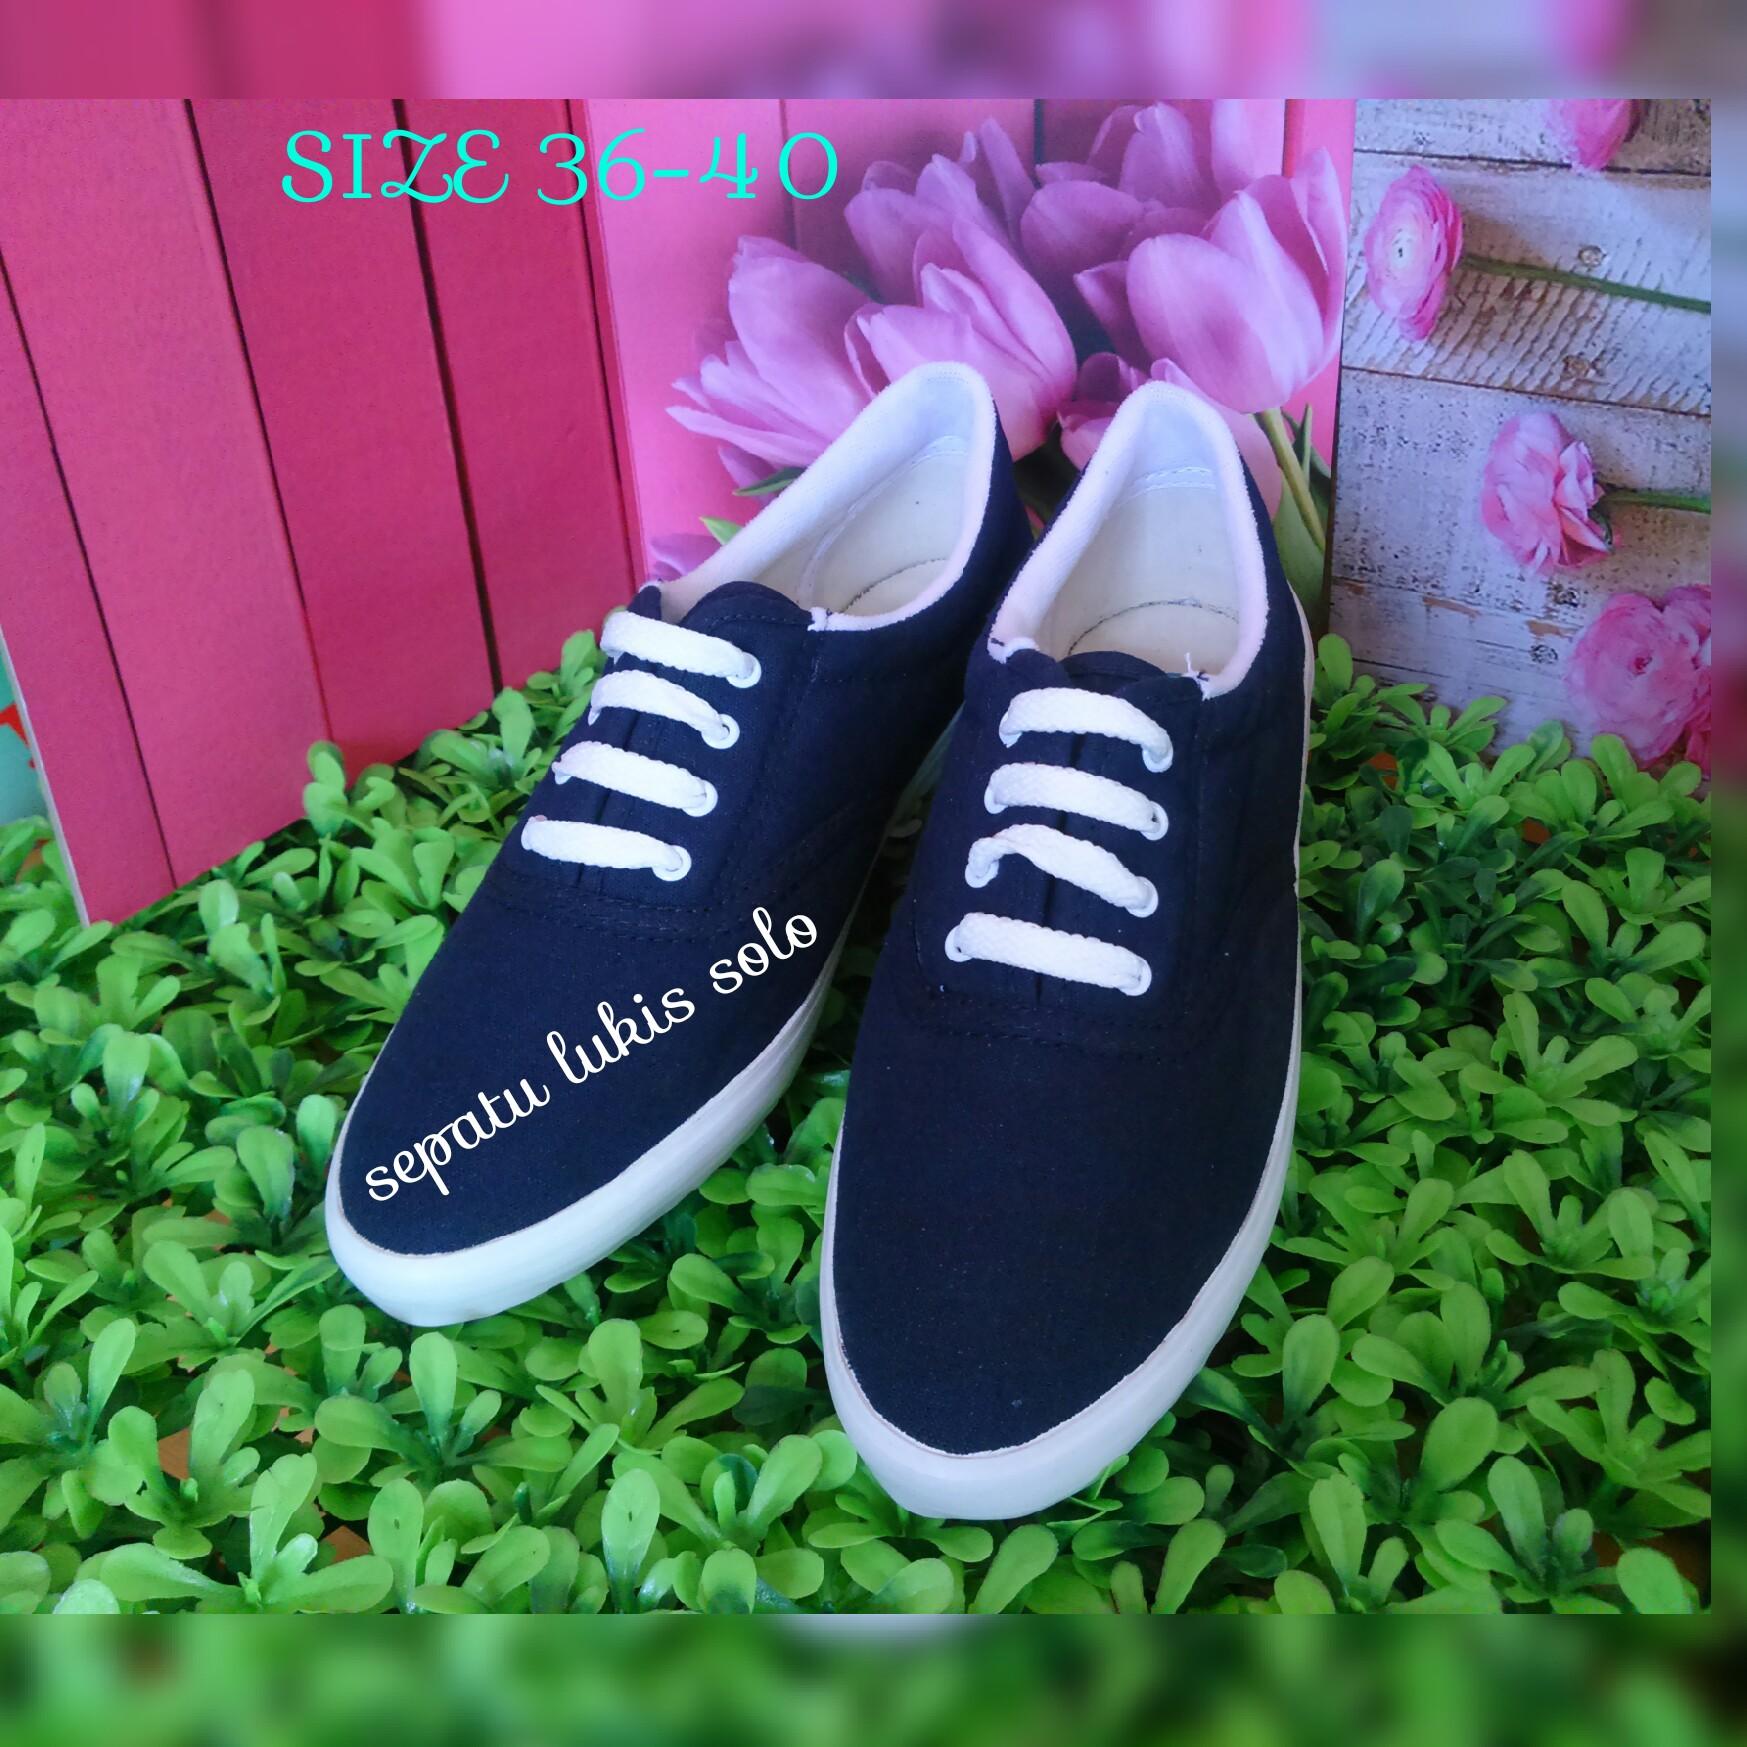 Jual Sepatu KAnvas polos biru navy flat shoes sepatu cewek grosir sepatu Sepatu Lukis Solo